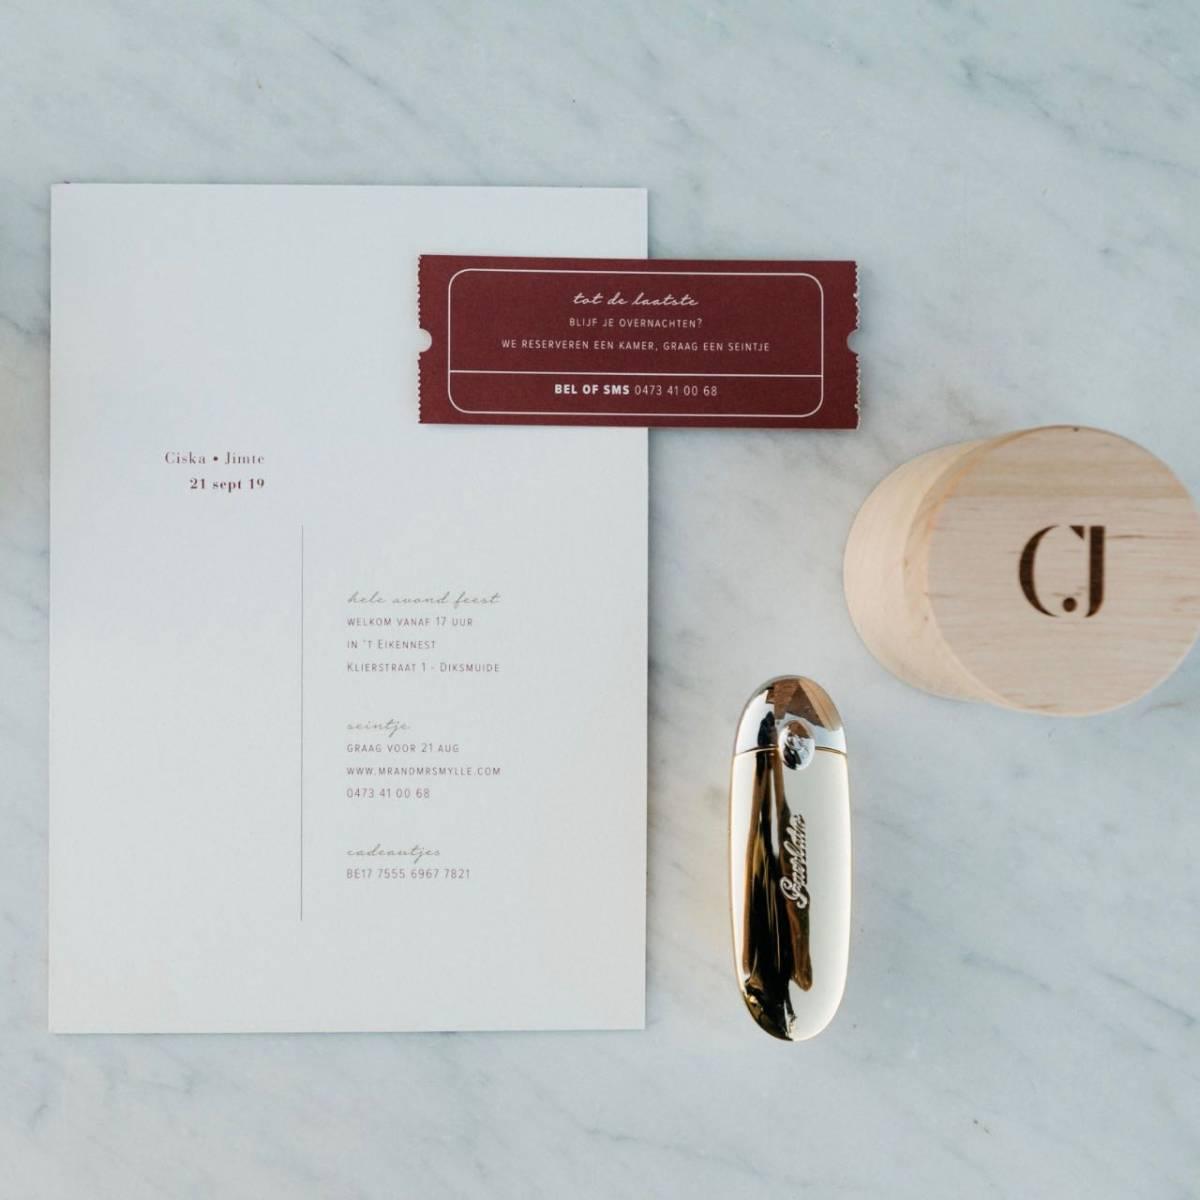 Scarabar - Trouwuitnodiging - Huwelijksuitnodiging - Drukwerk - Huwelijk - Trouw - Bruiloft - House of Weddings - 48